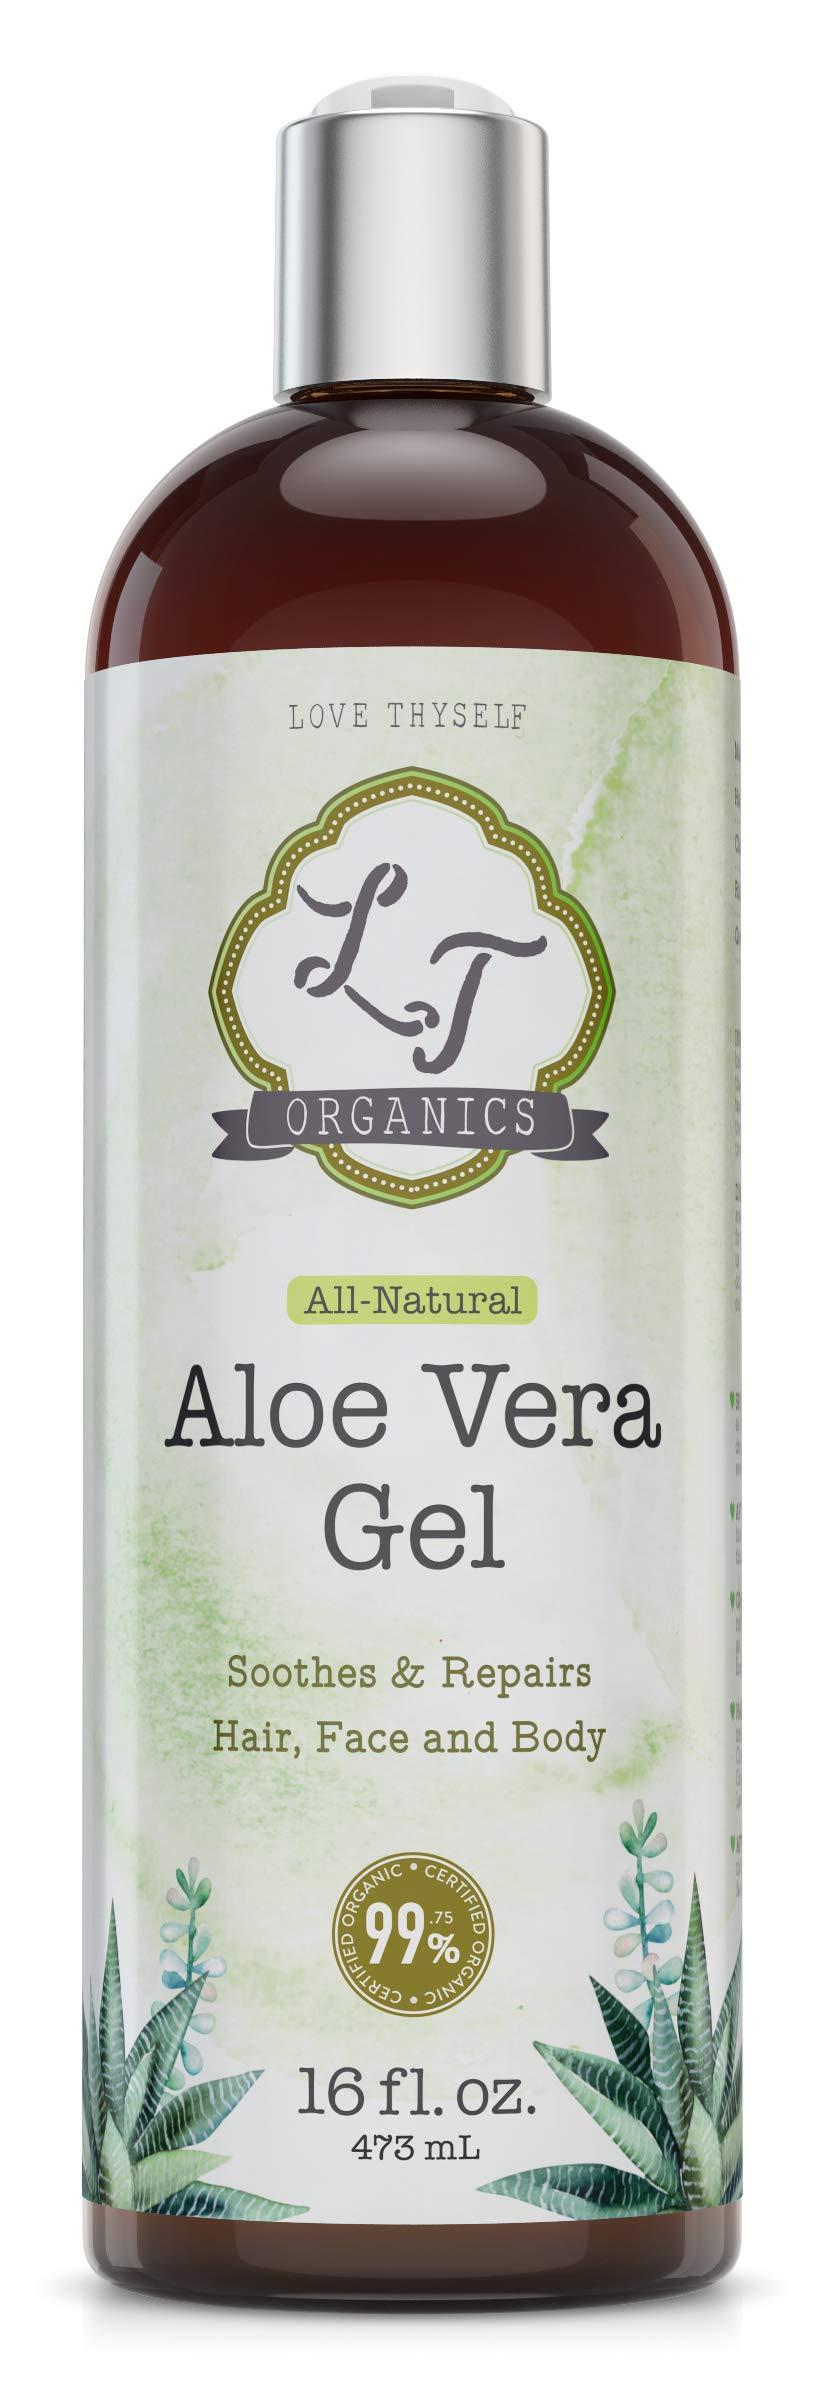 99% USDA Organic-Pure-Aloe-Vera-Gel 16oz| For Face, Hair, Skin Care & Acne, Sunburn, Bug Bite, Rashes, Eczema Relief | 100 Percent Pure & Natural Cold Pressed Aloe Vera | Chemical & Preservative Free by LT Organics